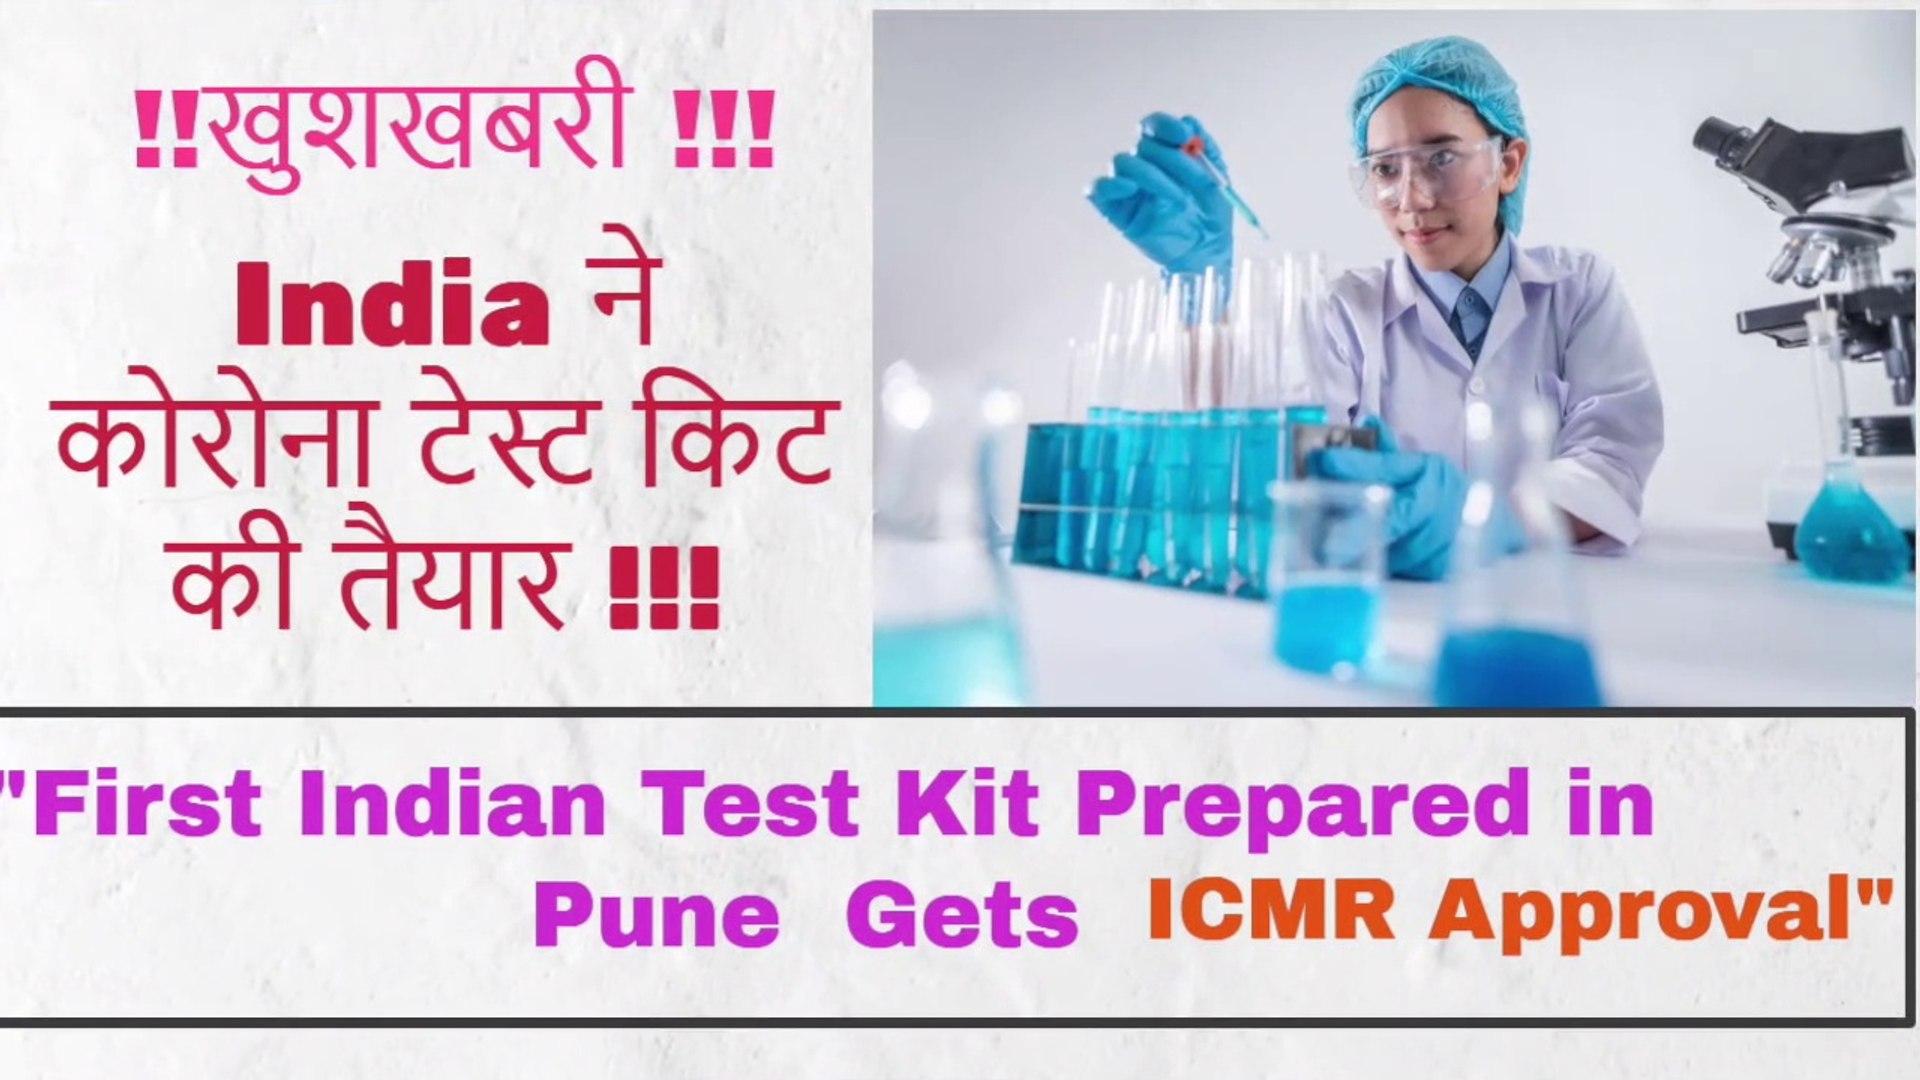 CORONA UPDATE | FIRST CORONA KIT DEVELOPED BY INDIA | भारत ने  की कोरोना किट  तैयार | COVID-19 |